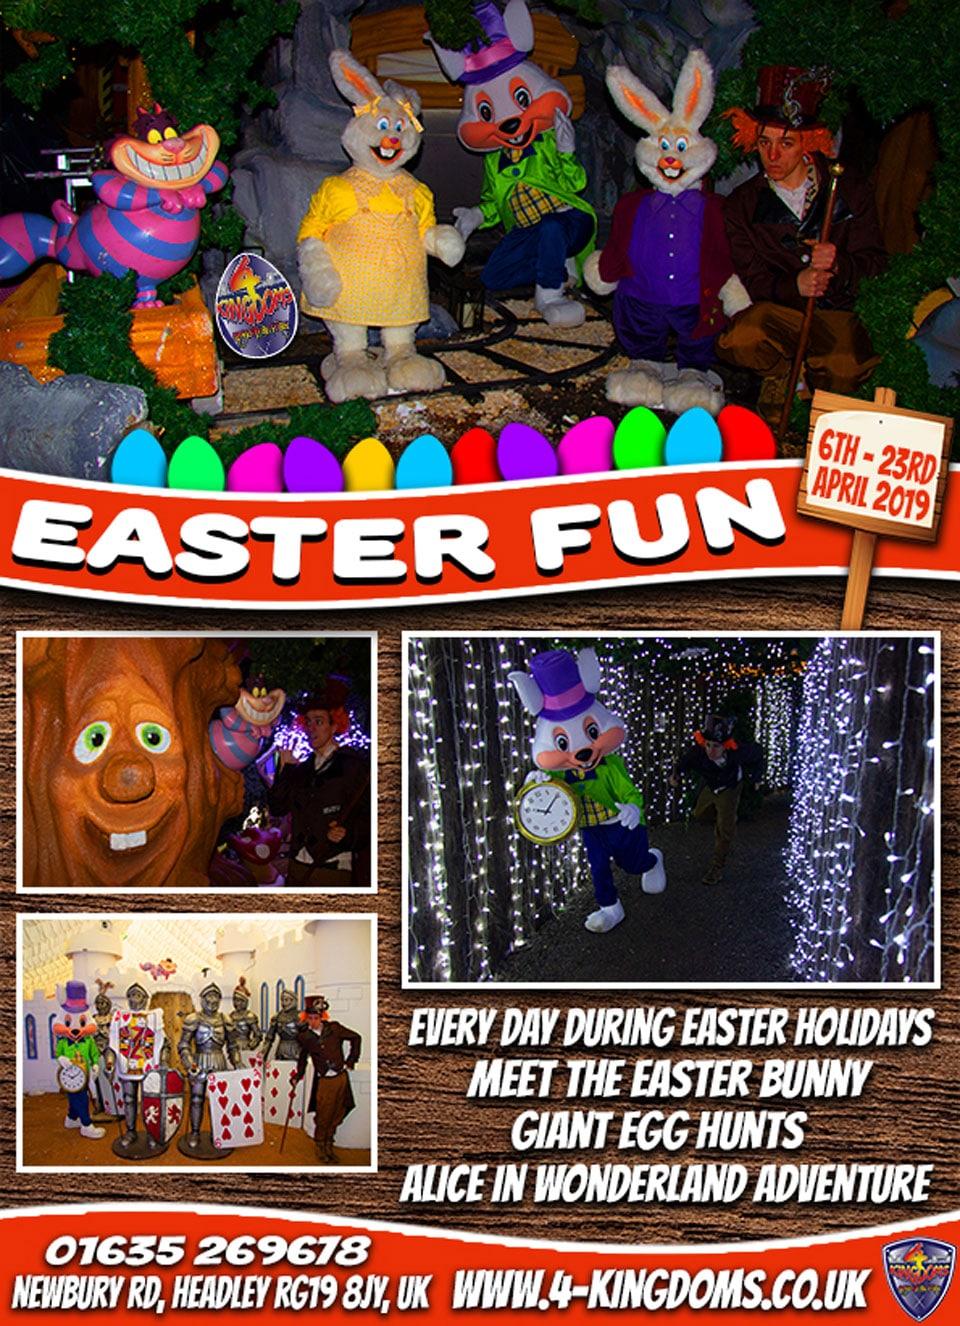 Easter School Holidays family Fun & Adventure